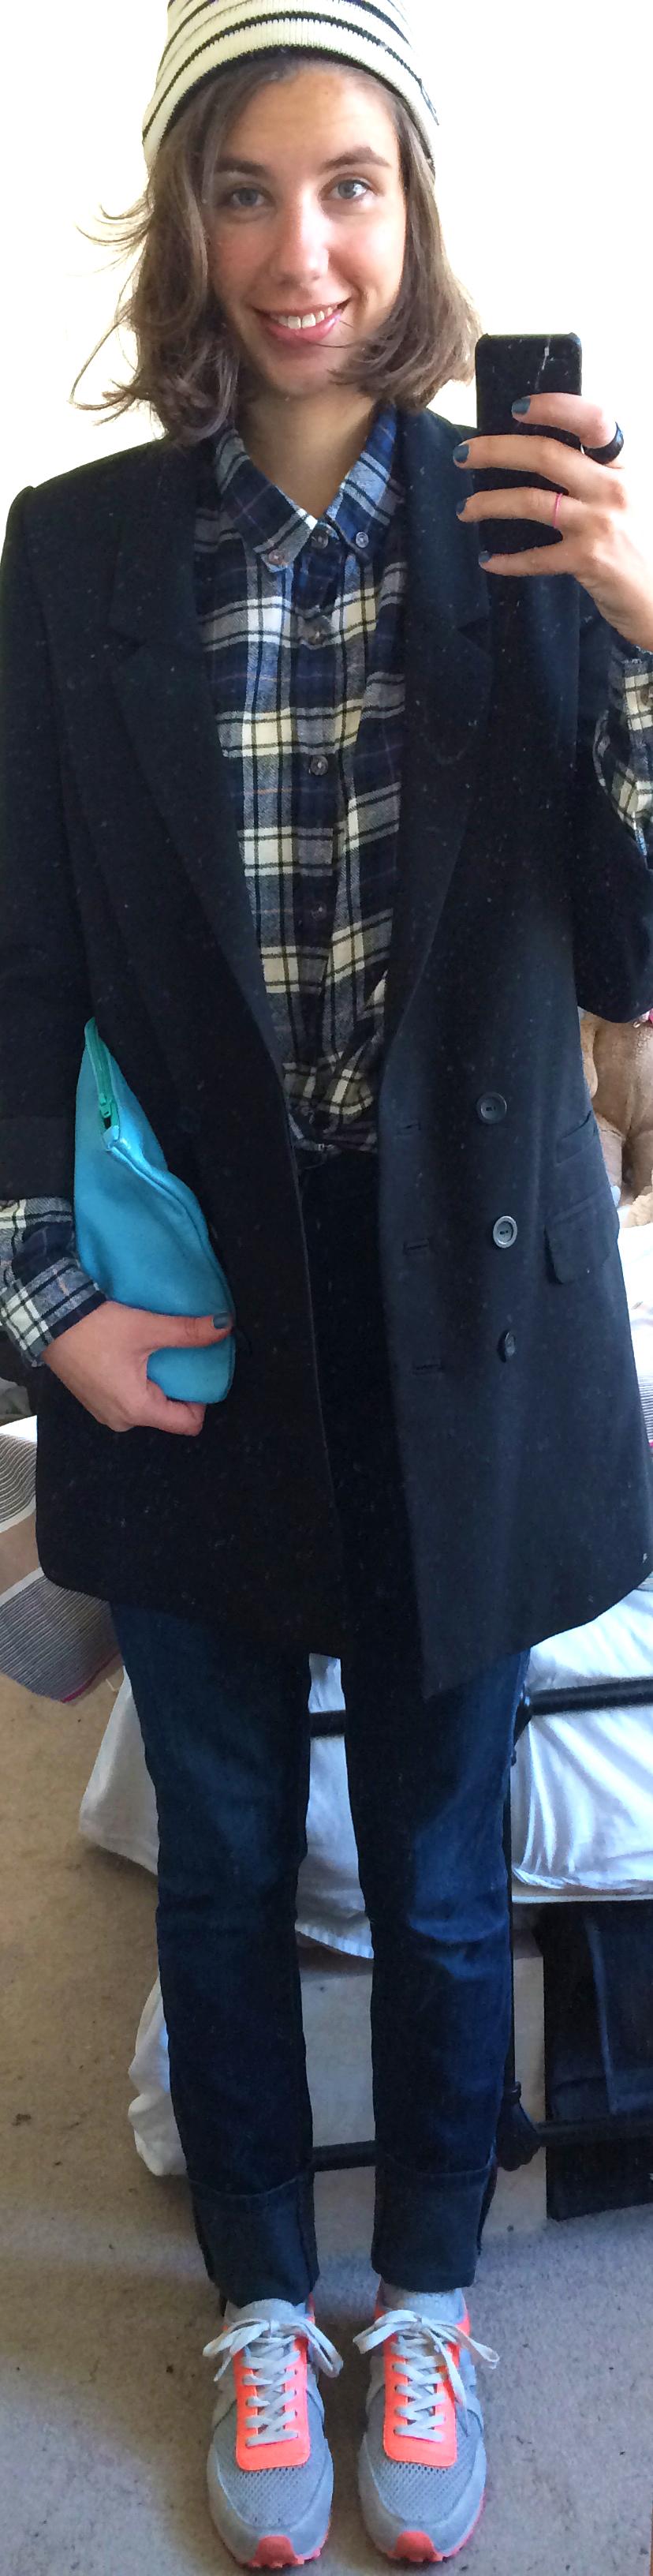 Levi's Jeans ,  Flannel Shirt ,  Blazer ,  Neon Sneakers ,  Saint James Knit Hat ,  Leather Clutch